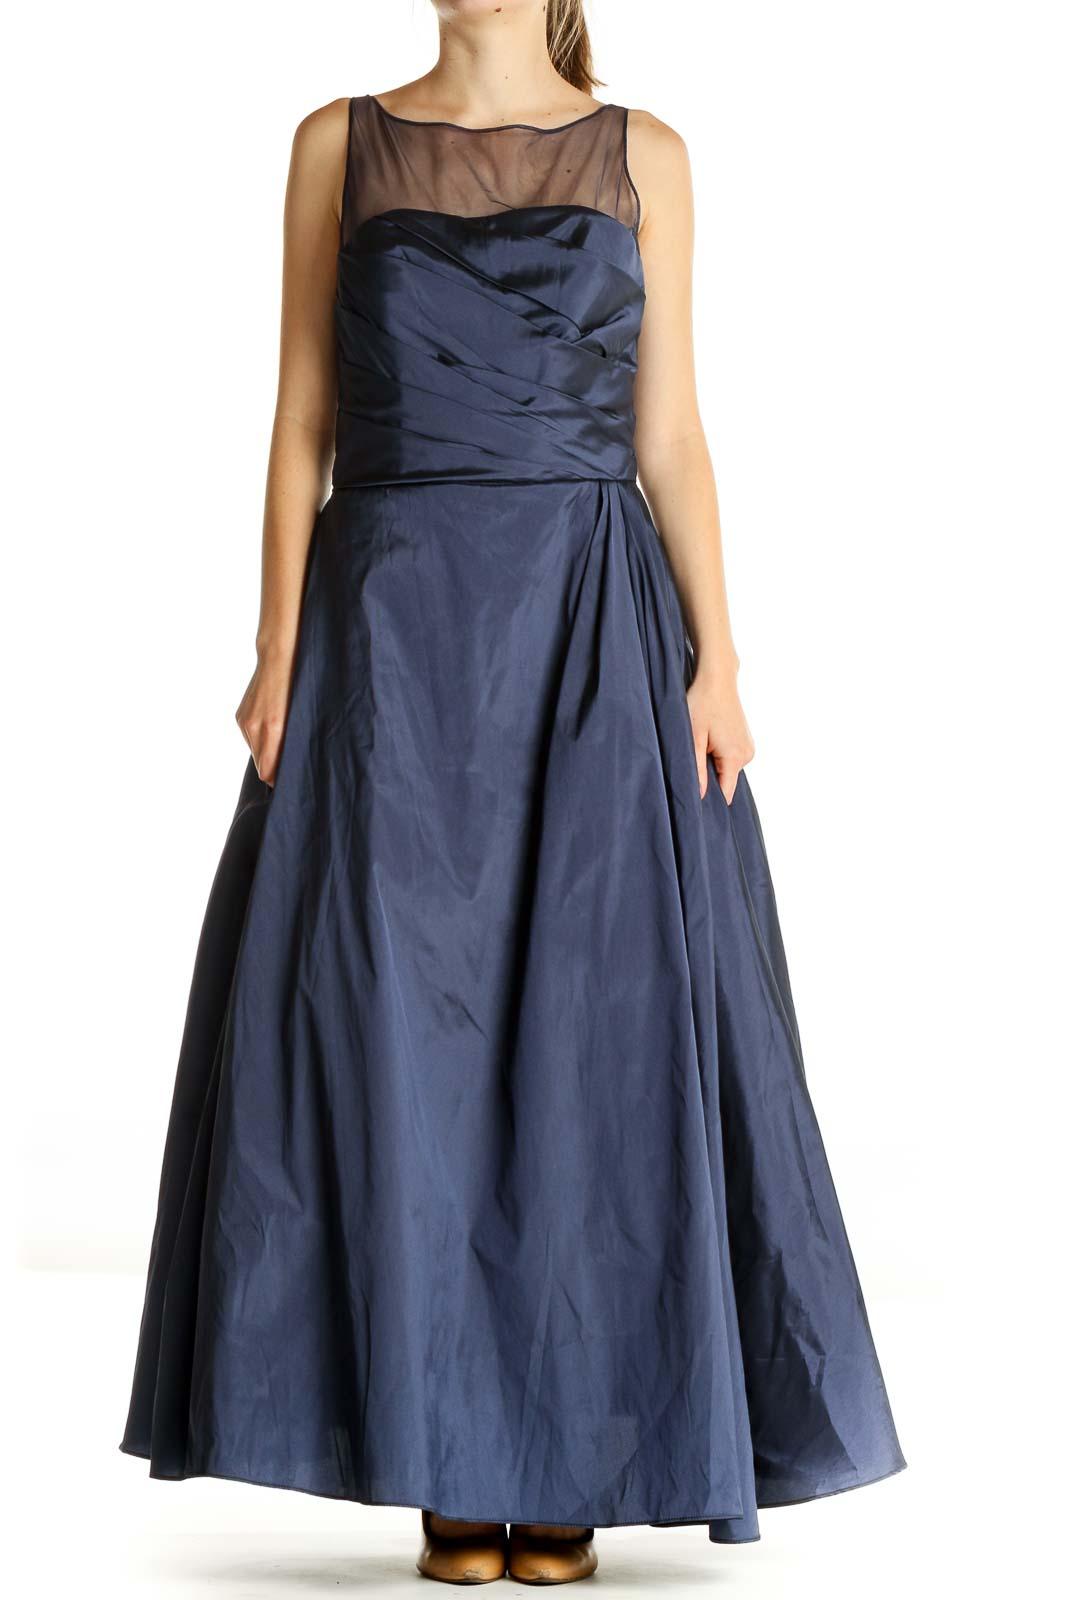 Blue Solid Formal Fit & Flare Dress Front